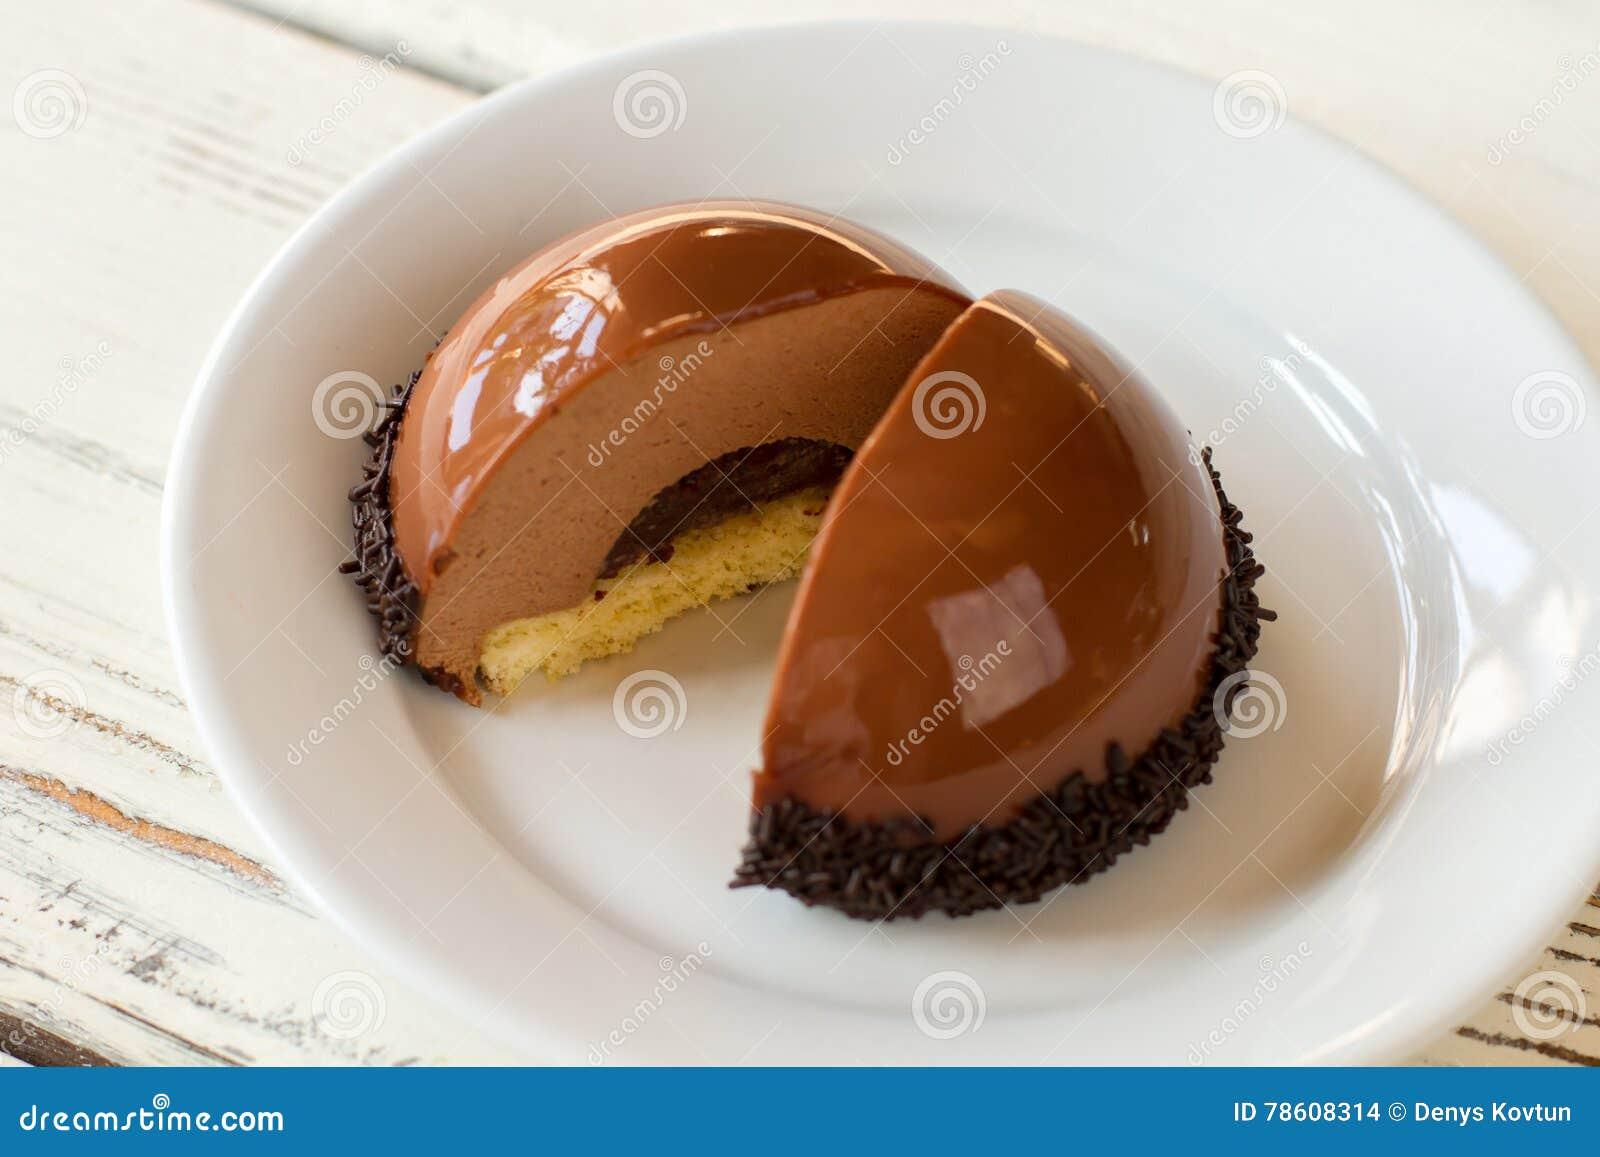 Sliced Half Sphere Dessert Stock Photo Image 78608314